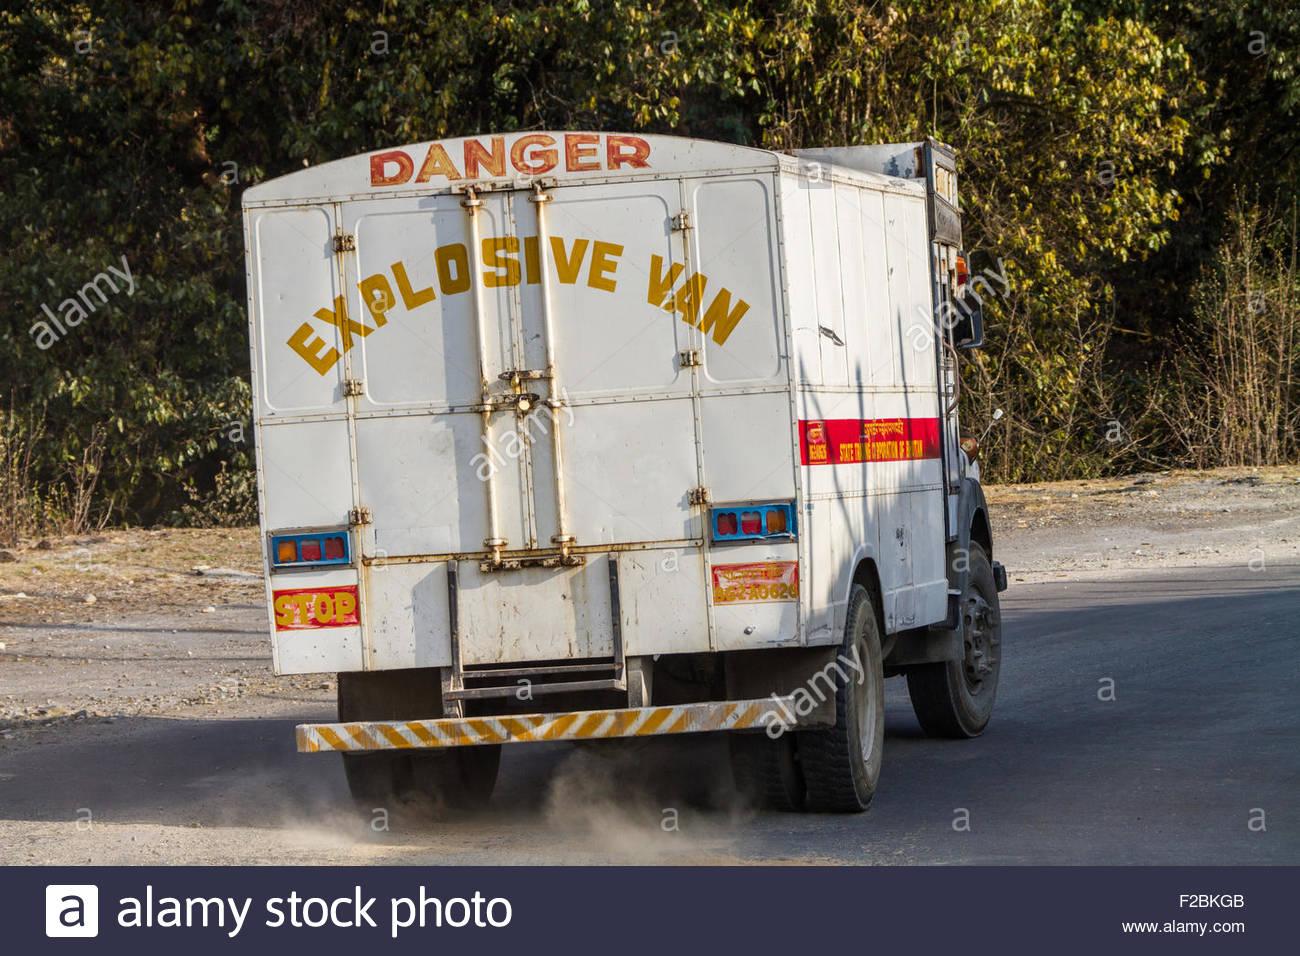 An Explosives truck drives through central Bhutan - Stock Image